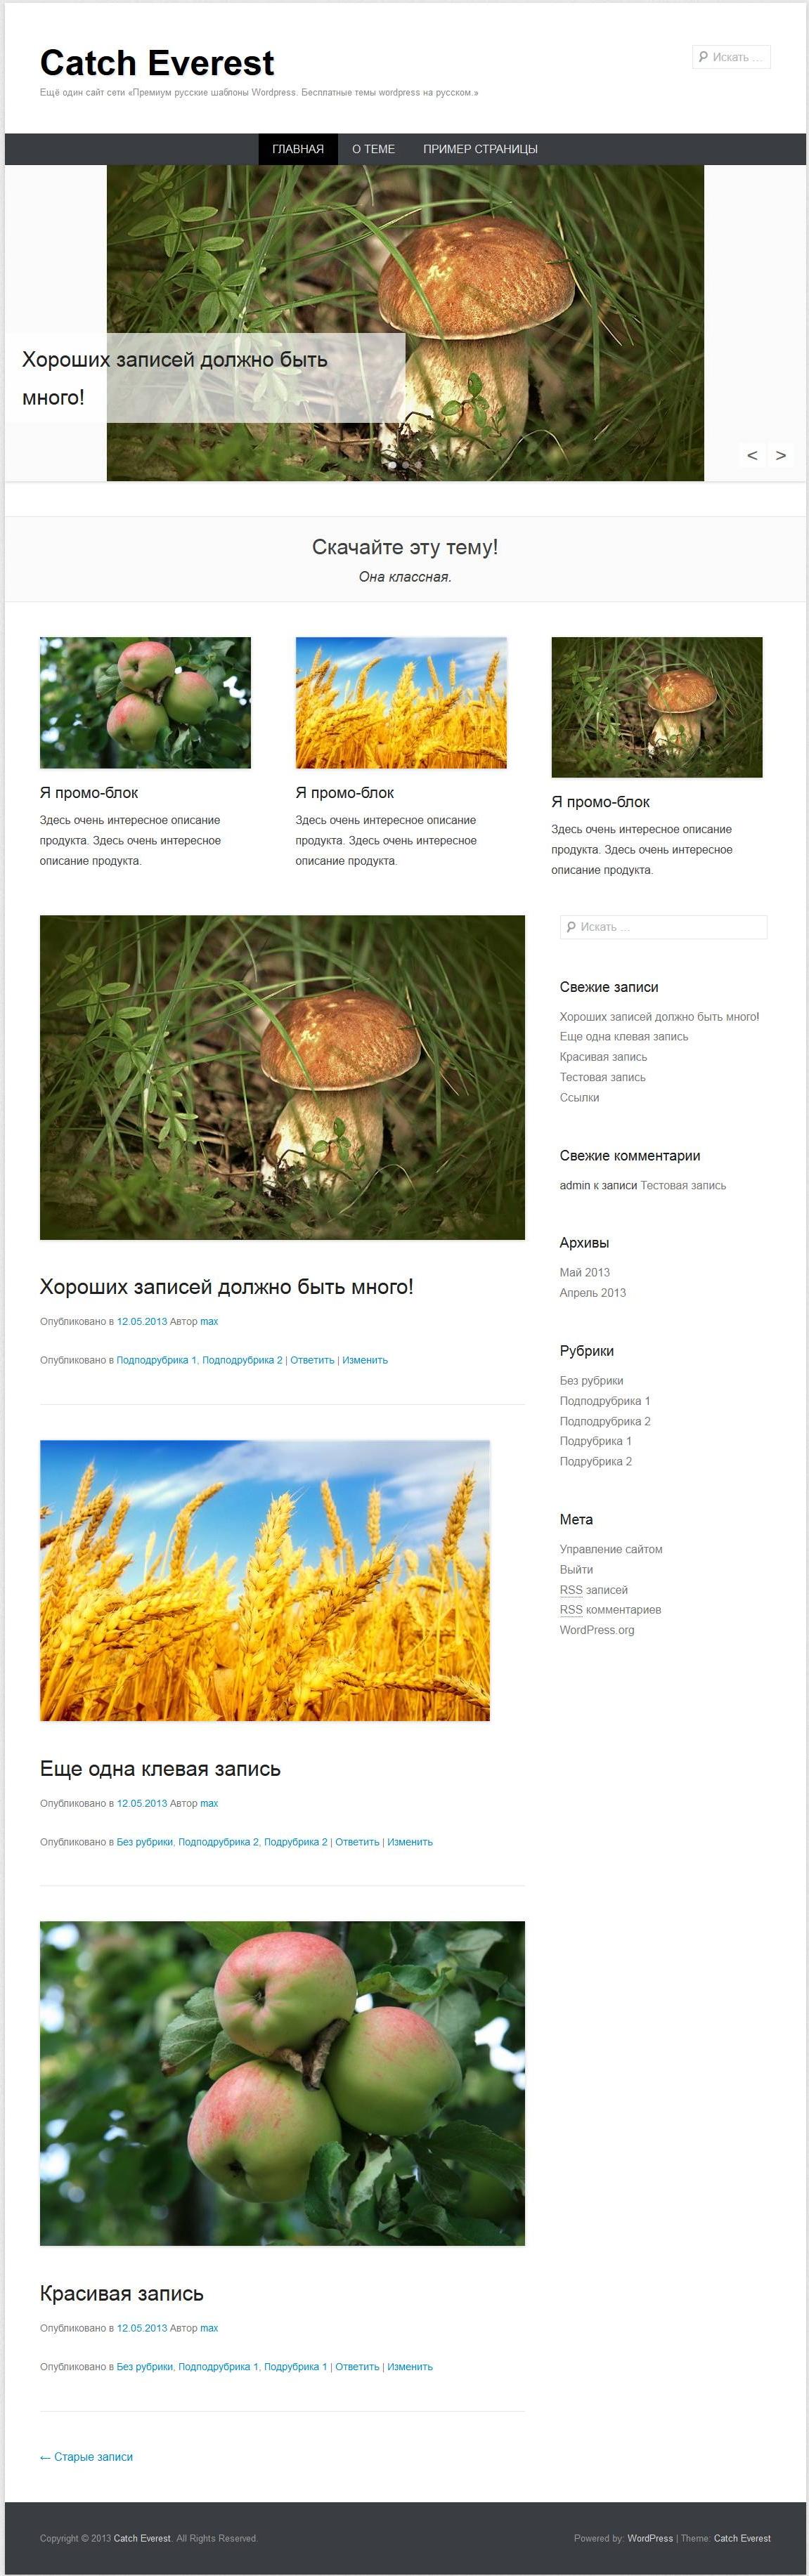 Catch Everest - русский шаблон wordpress